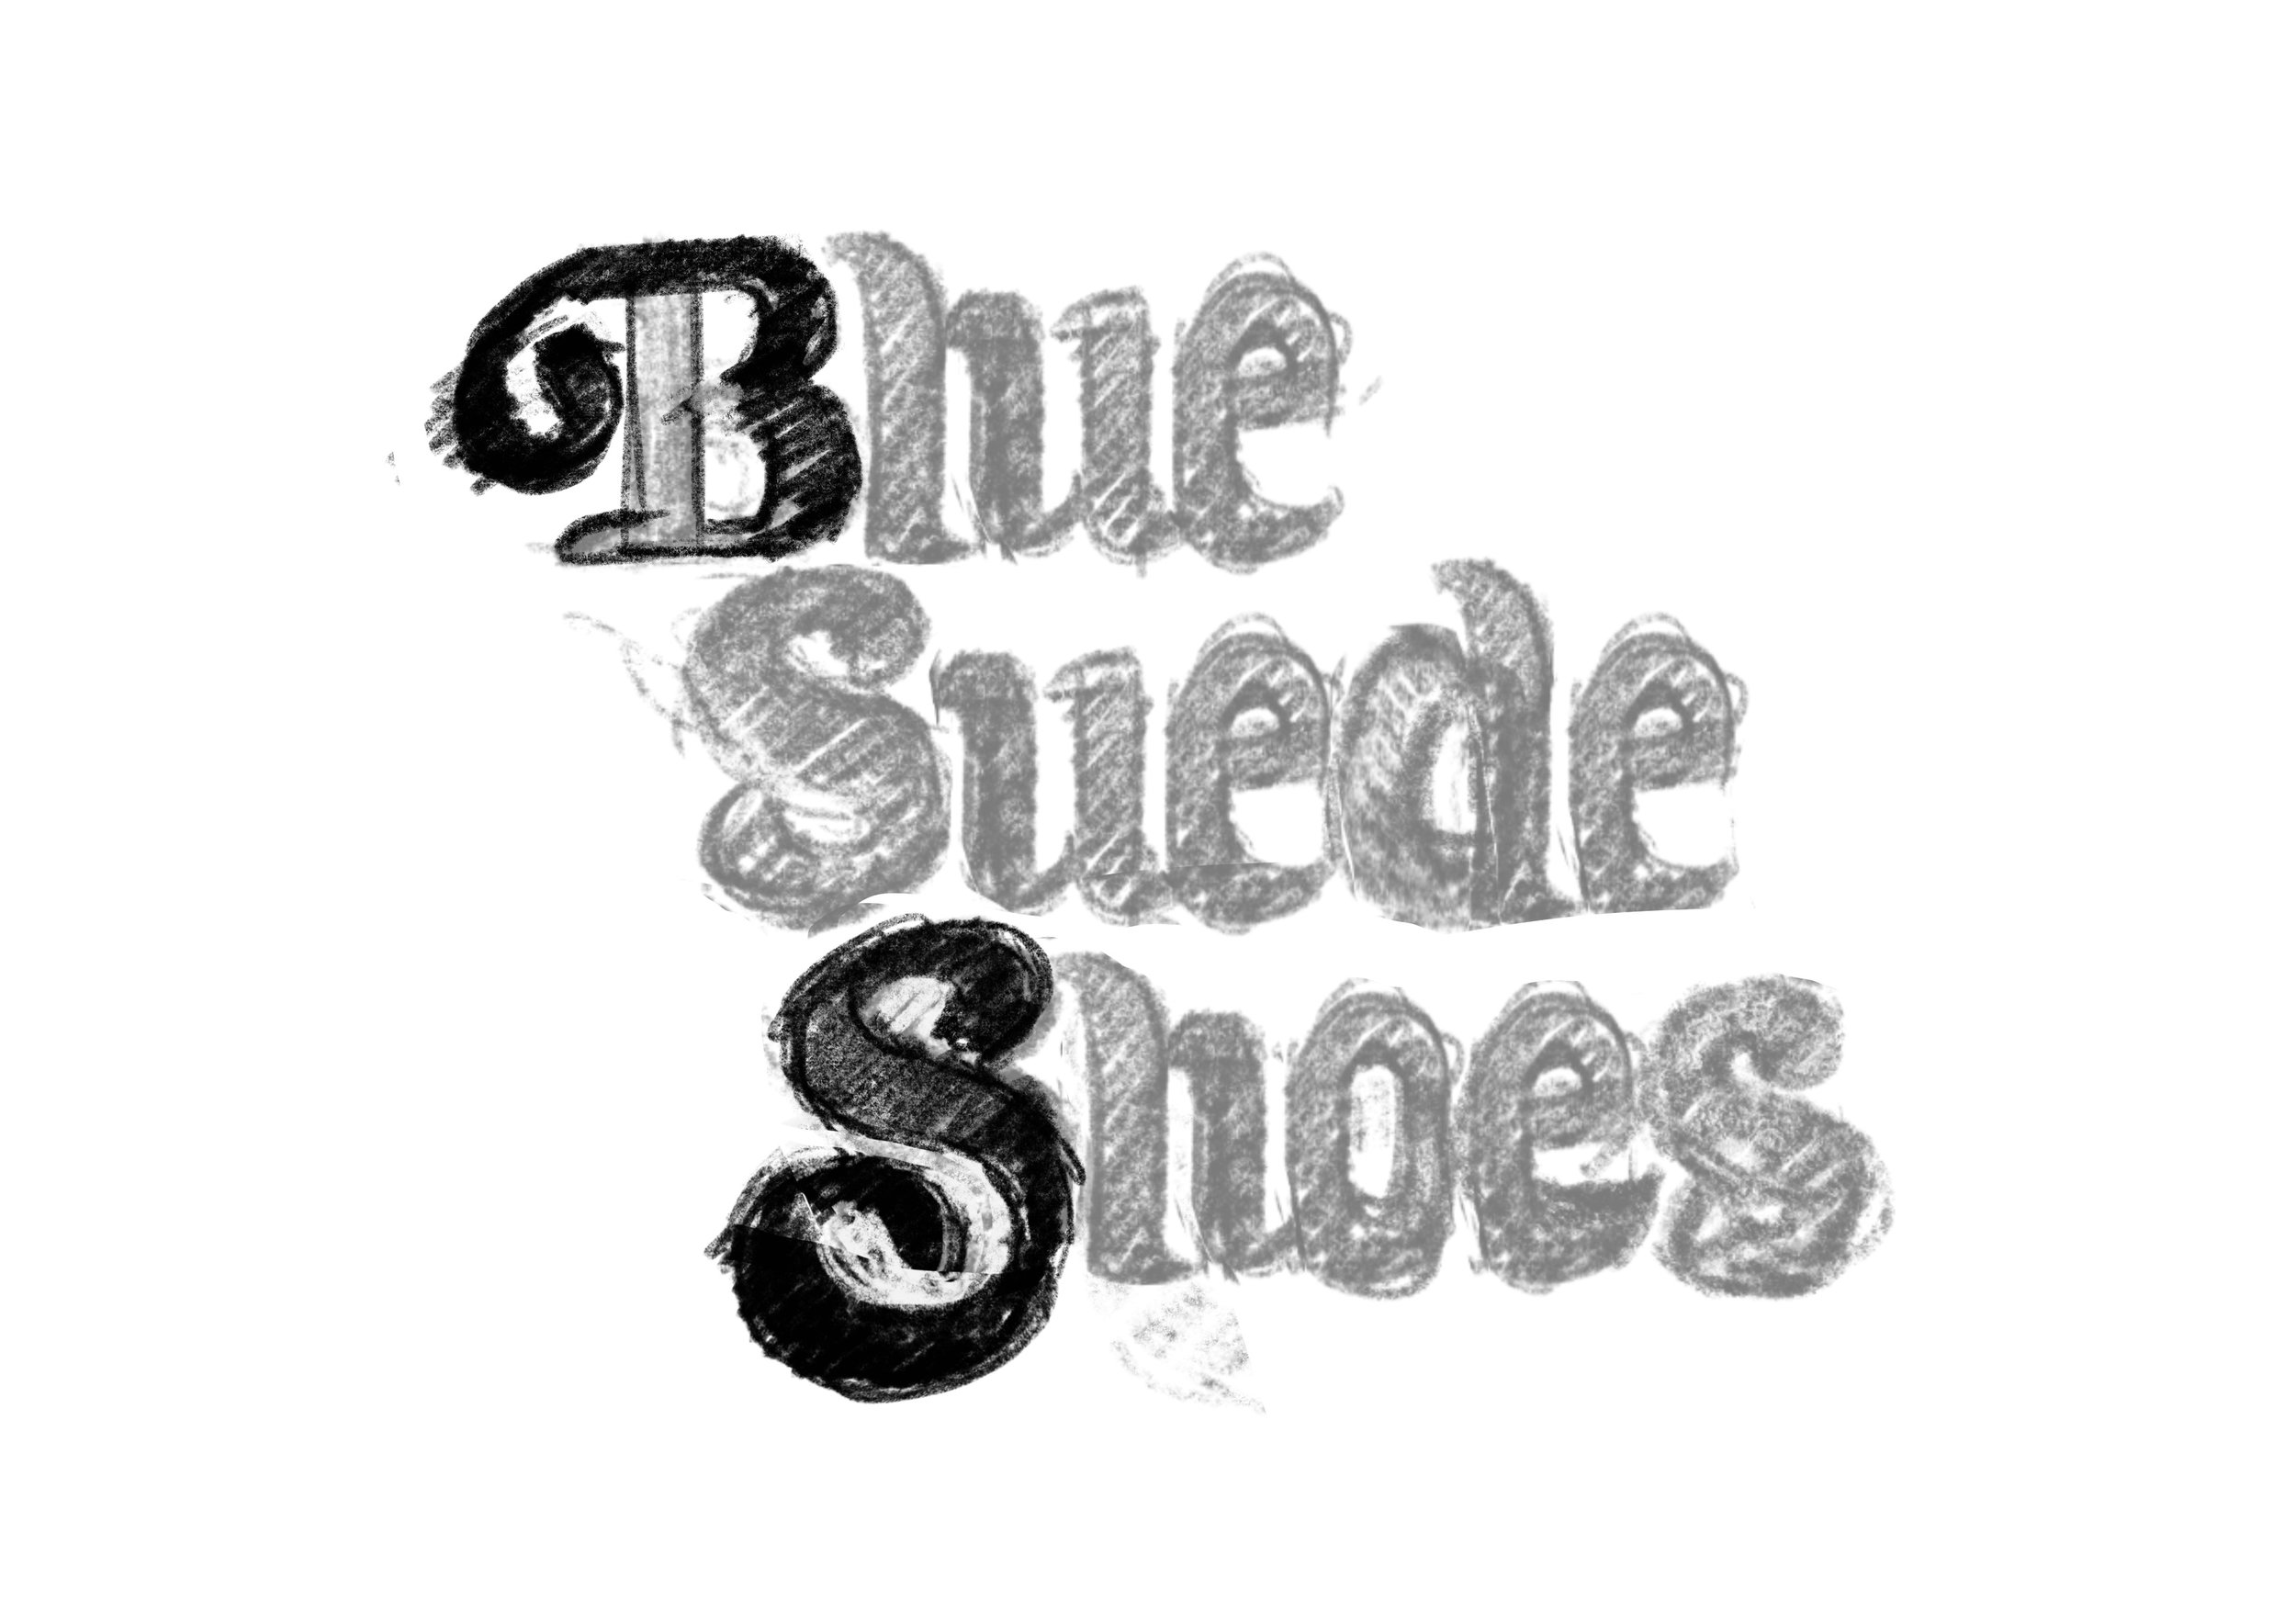 Blue_Suede_Shoes 5.jpg